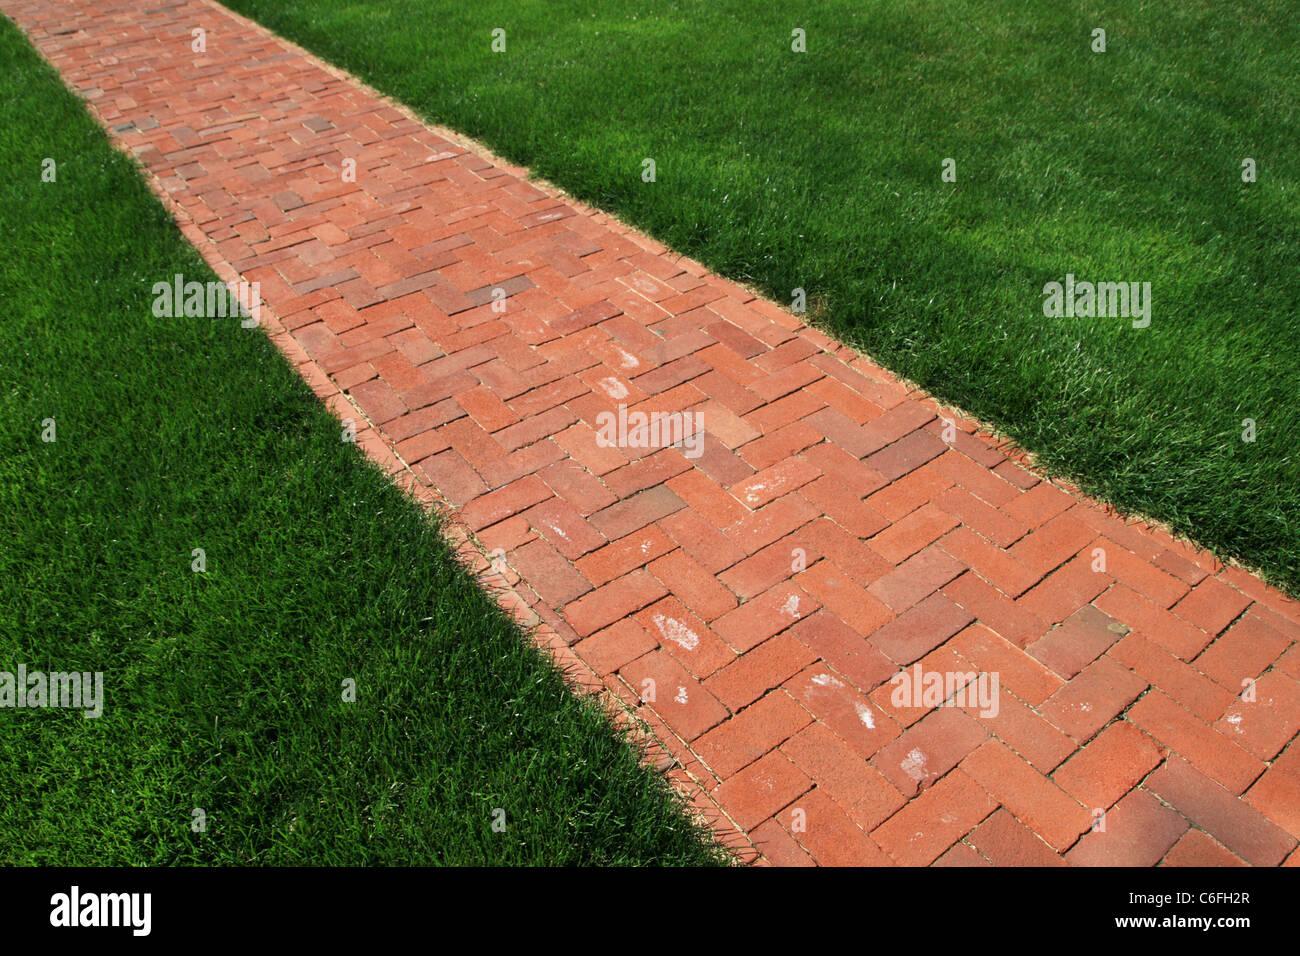 brick walkway diagonals across a green lawn - Stock Image